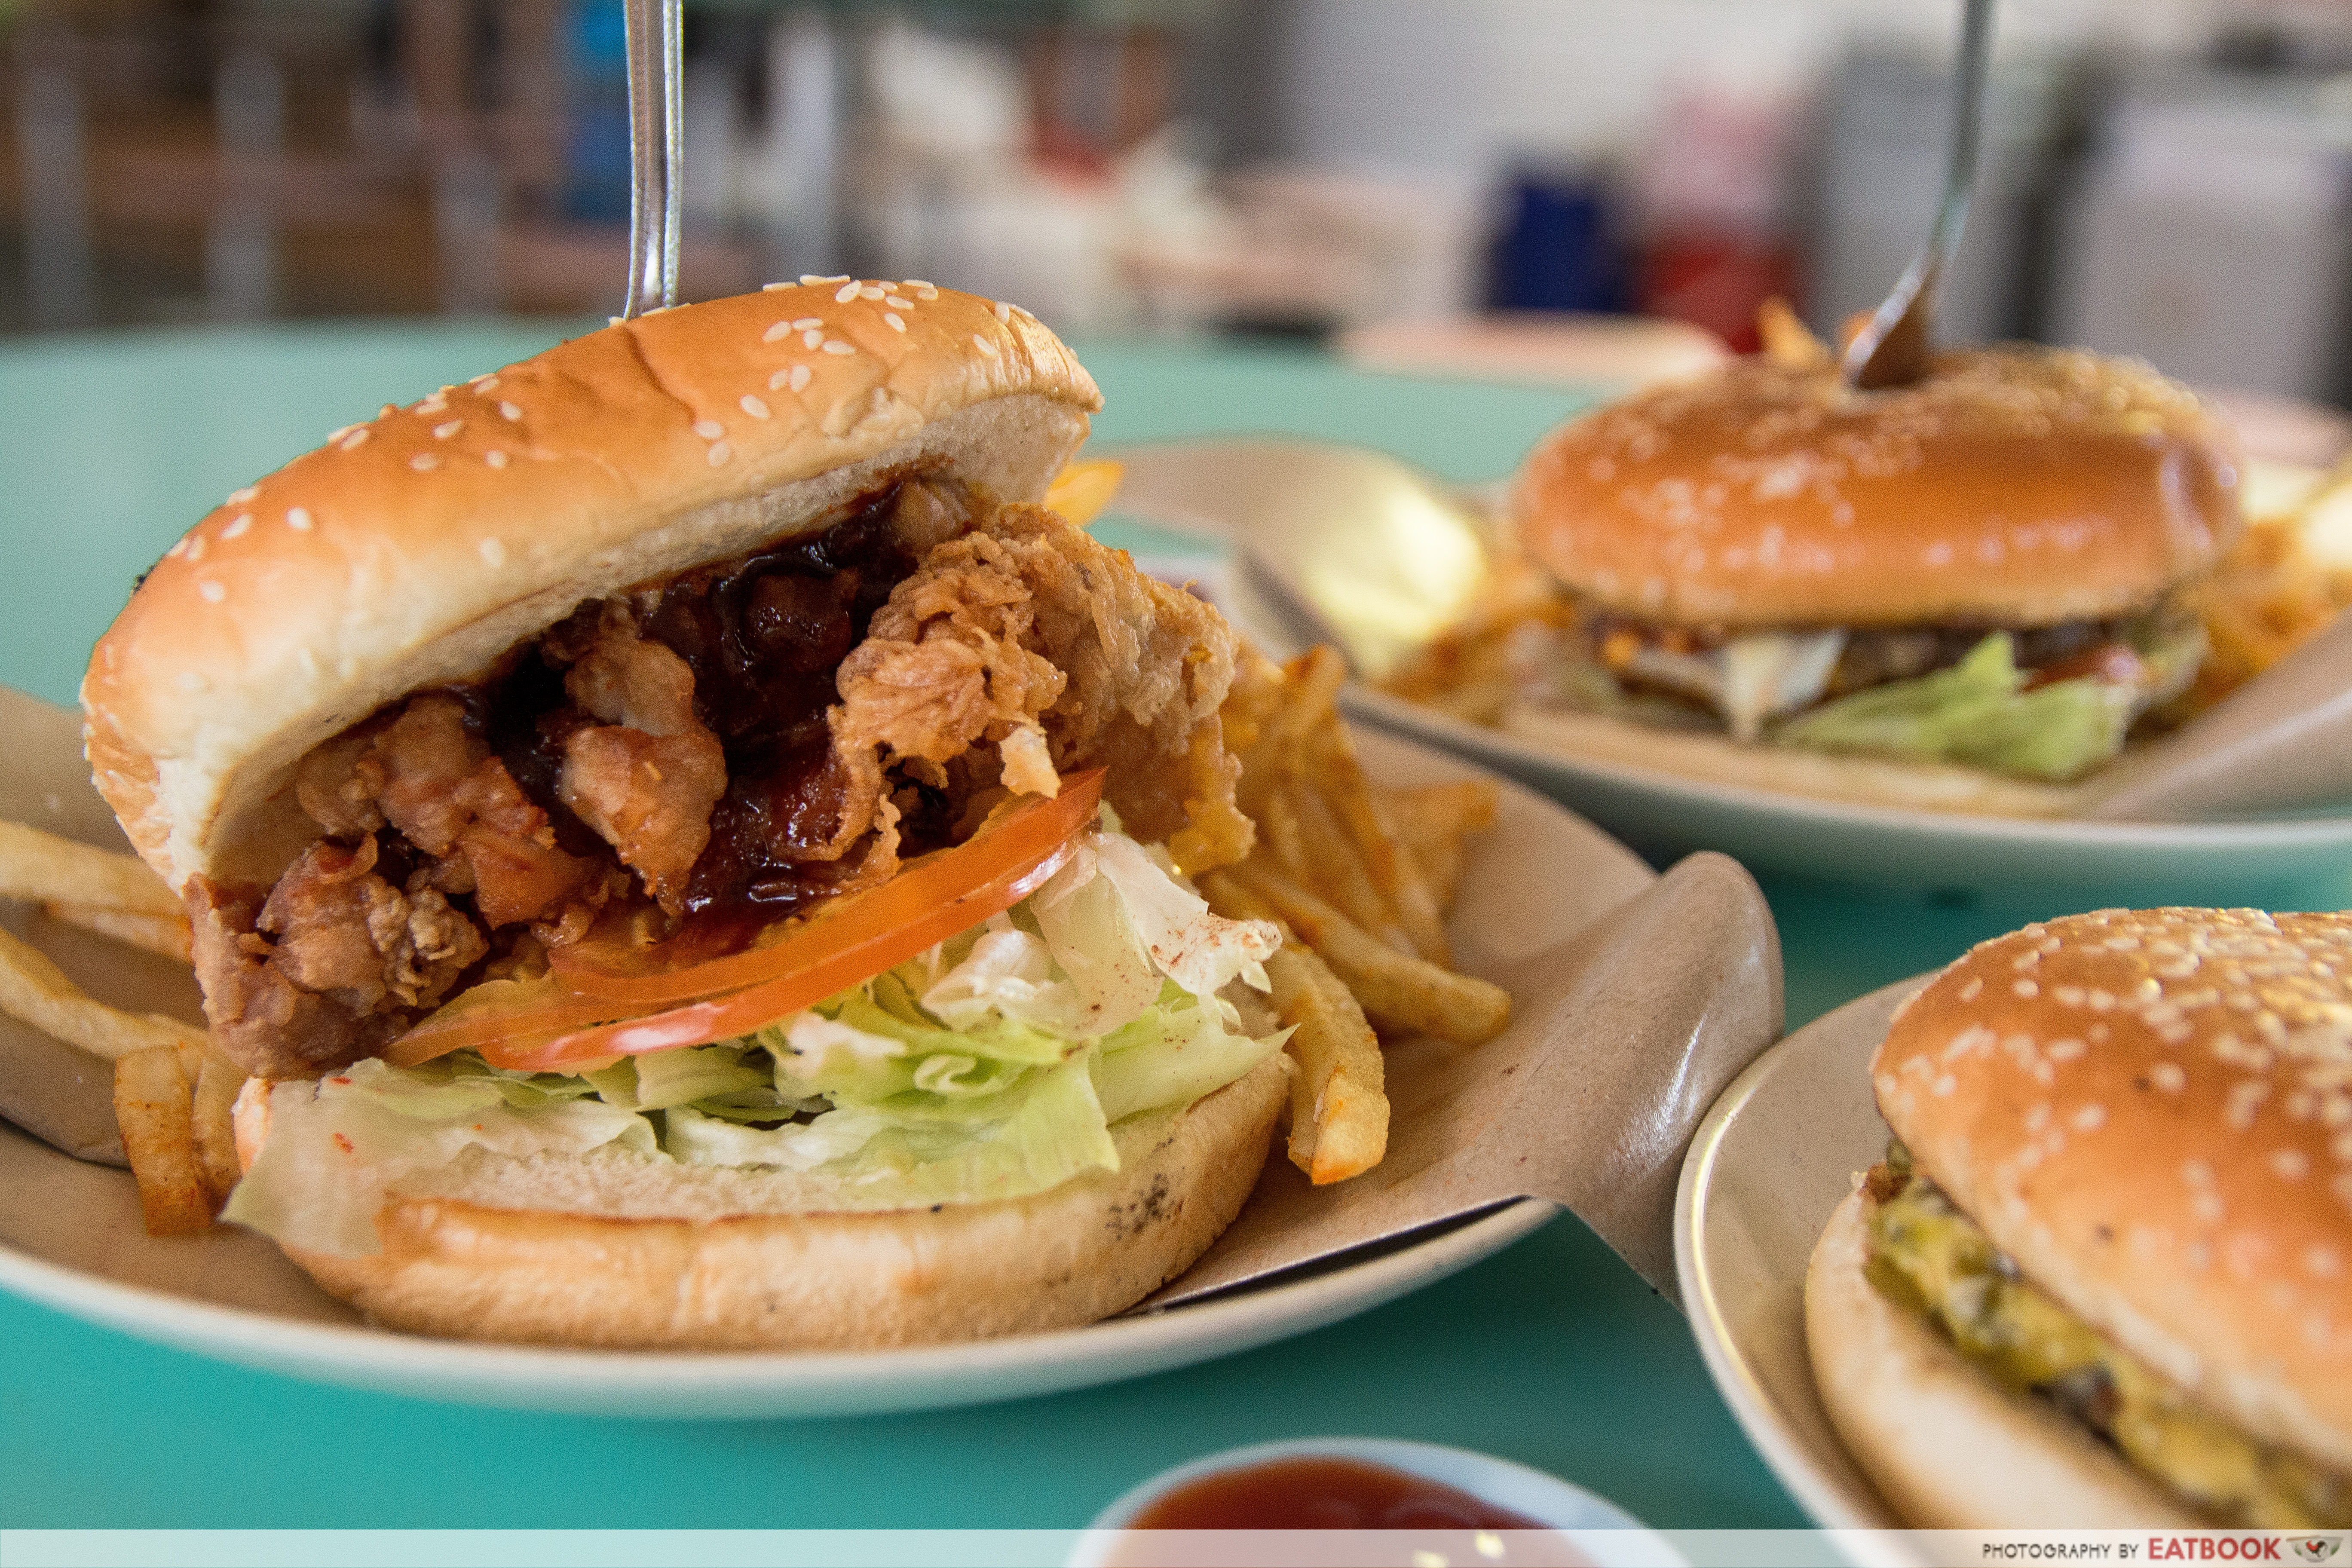 I Love Burger Lah! - Har Geong Gai Burger